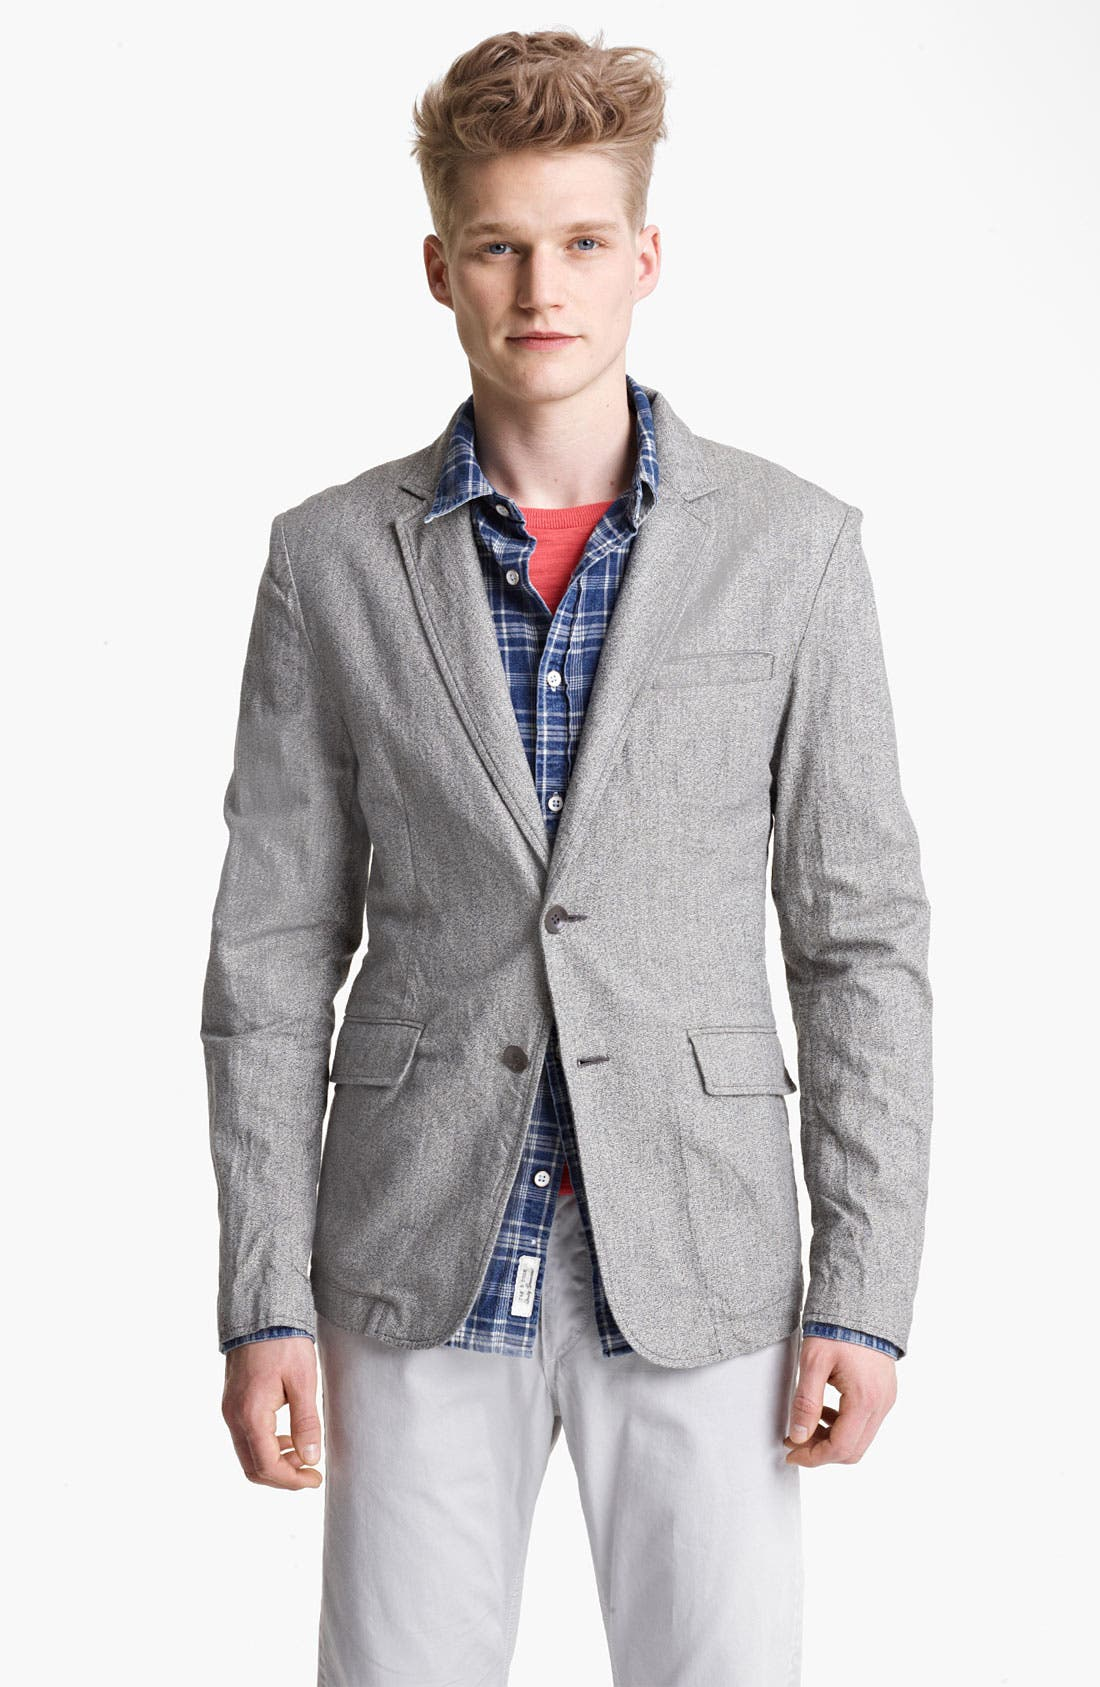 Main Image - rag & bone 'Phillips' Cotton & Linen Sportcoat